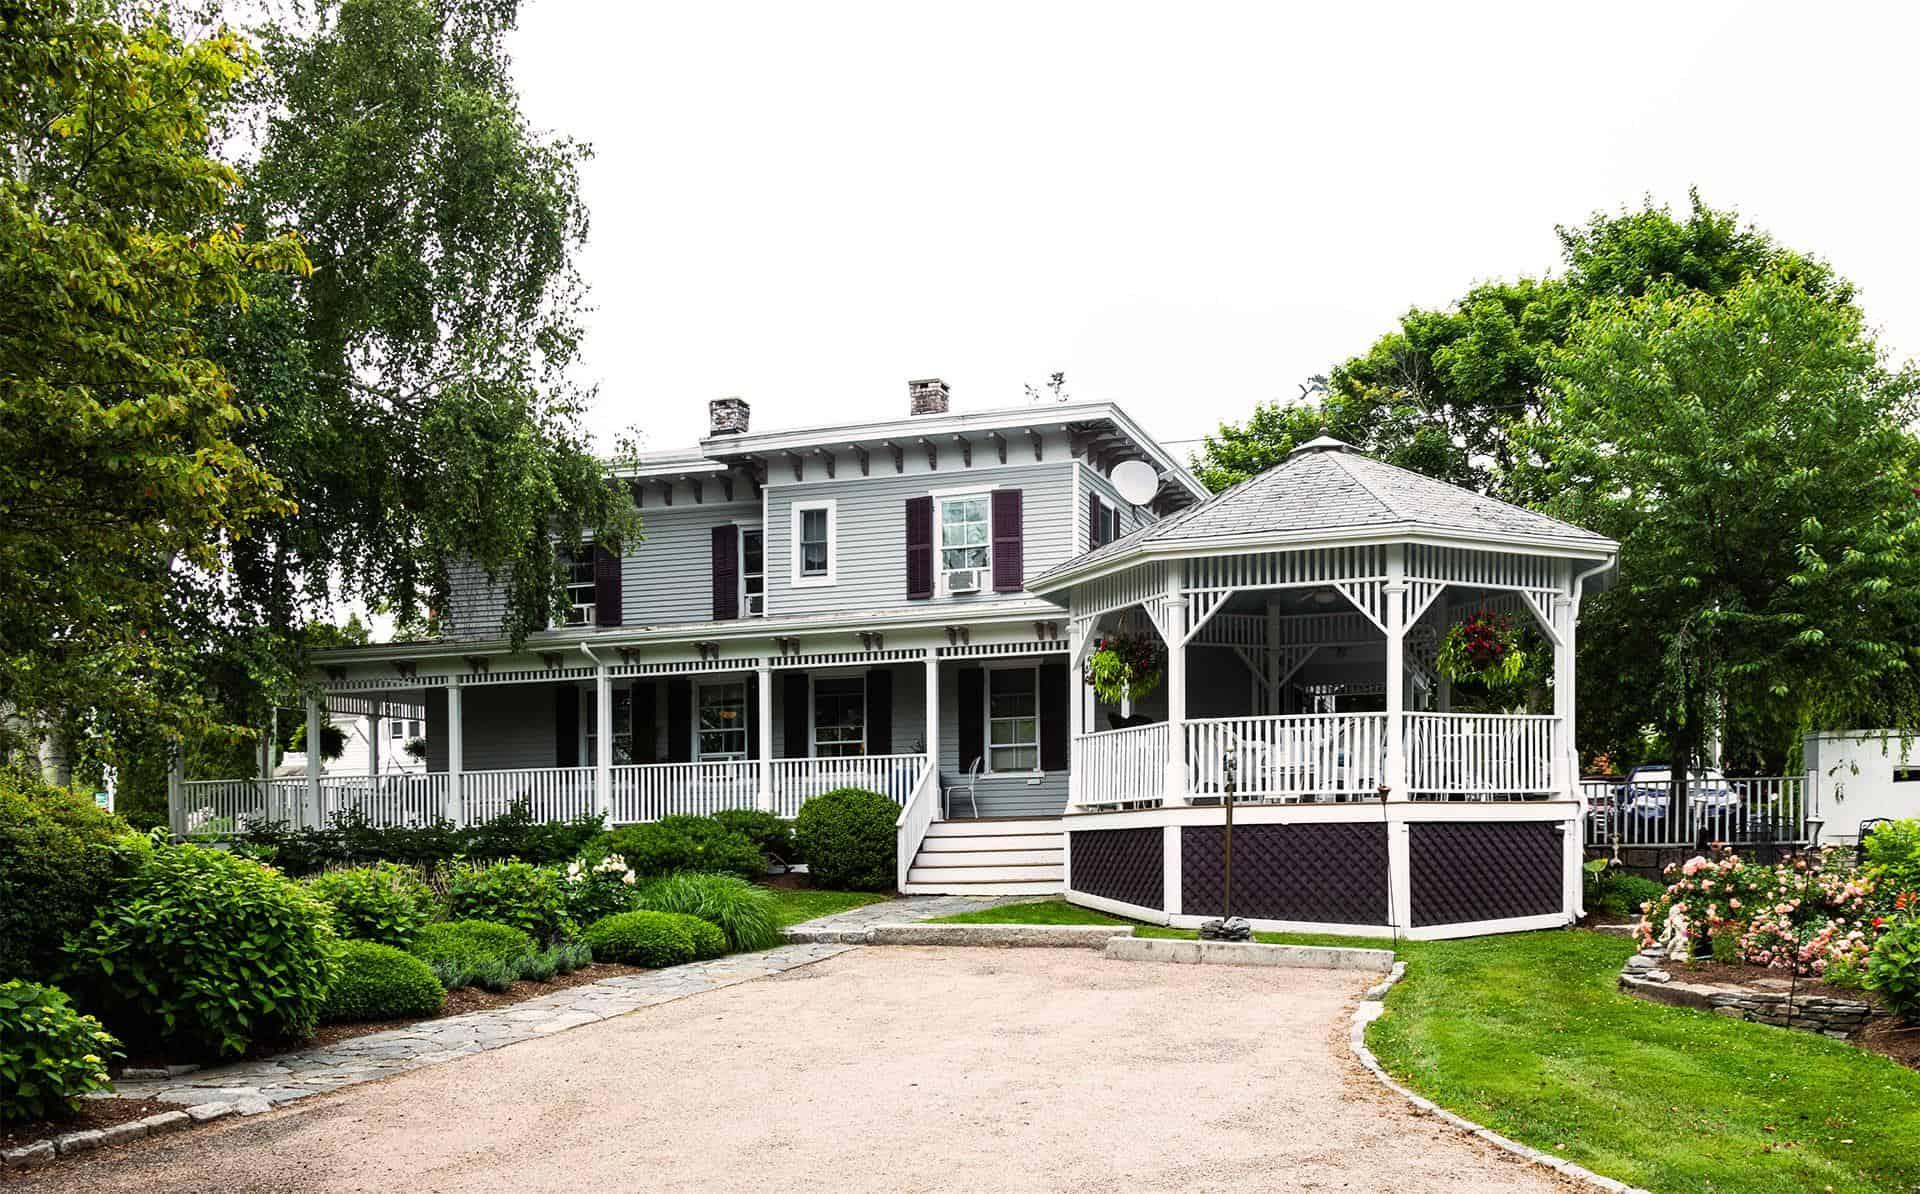 Green accommodation with a veranda